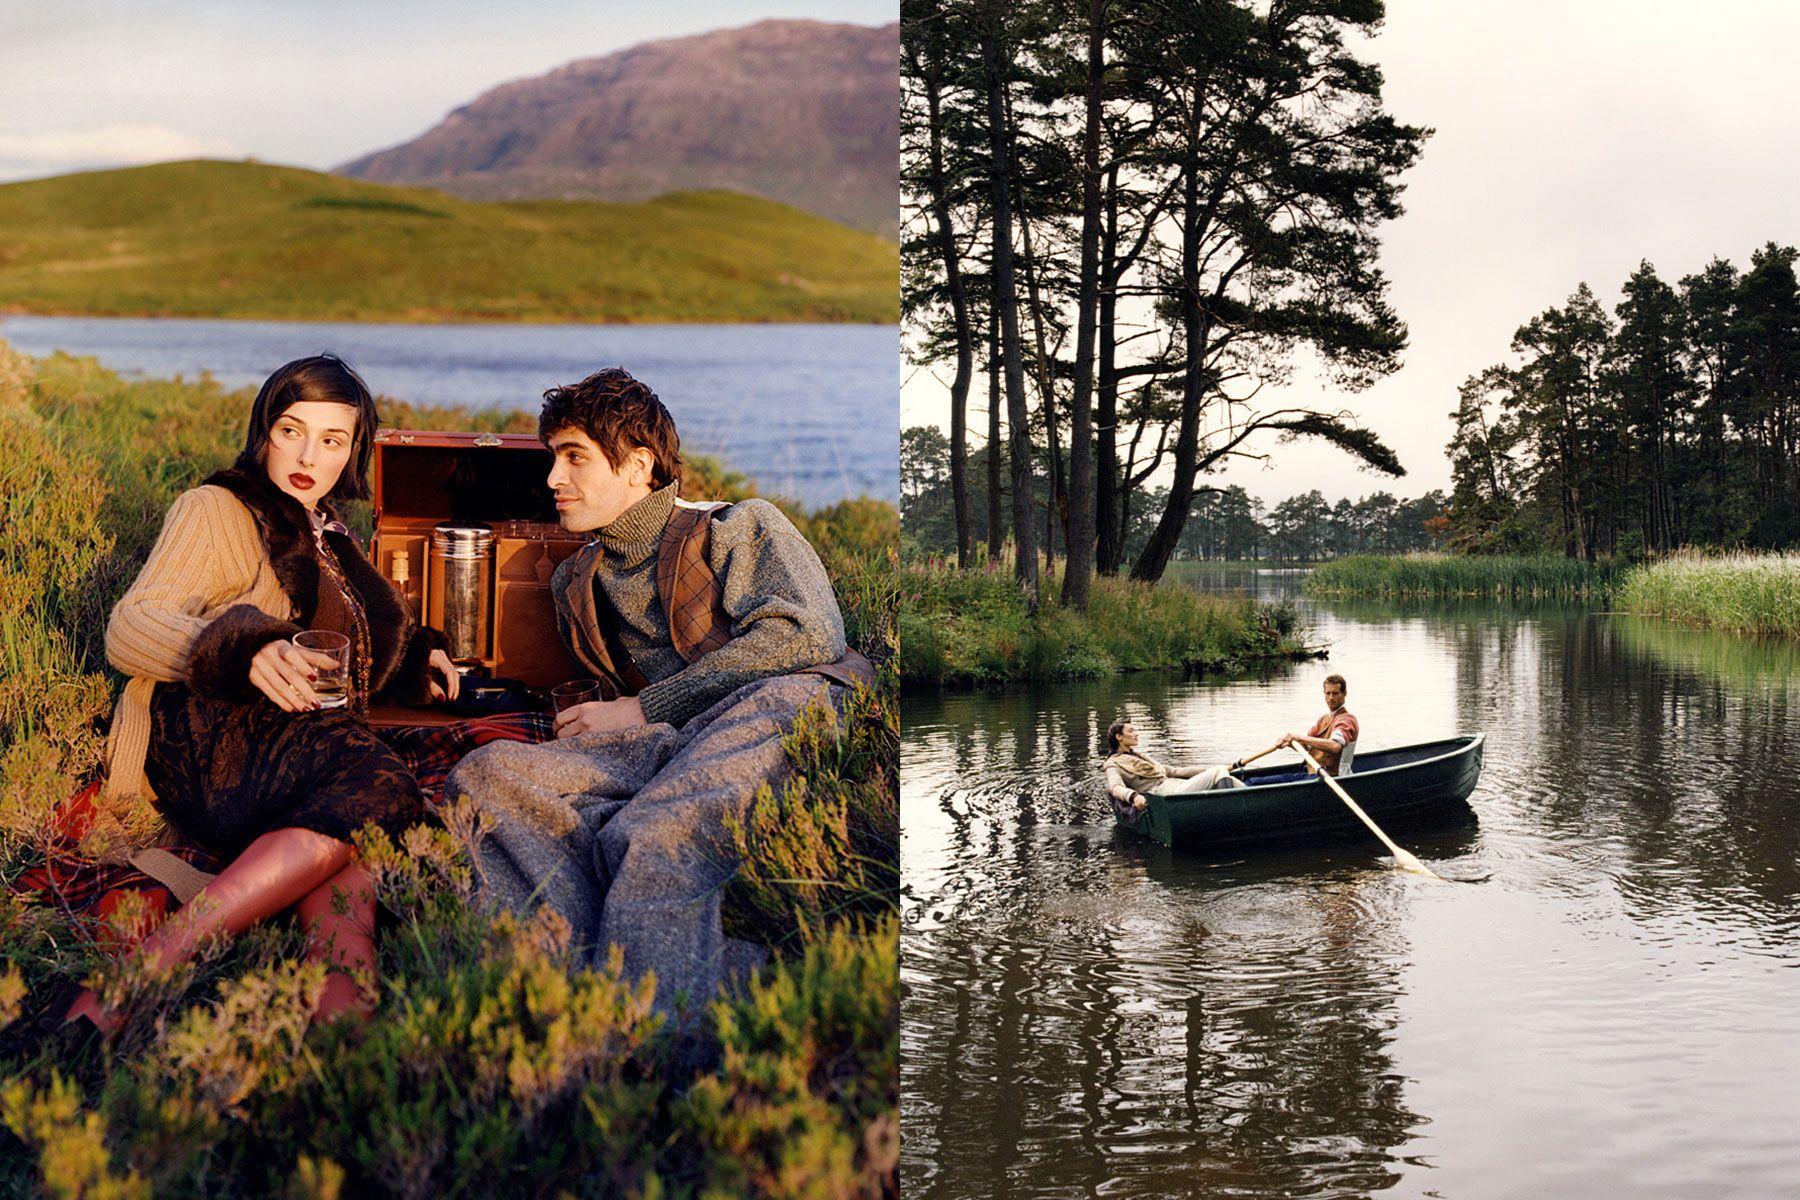 Conde_Nast_Traveler_Scotland_1995_dblpg_2.jpg